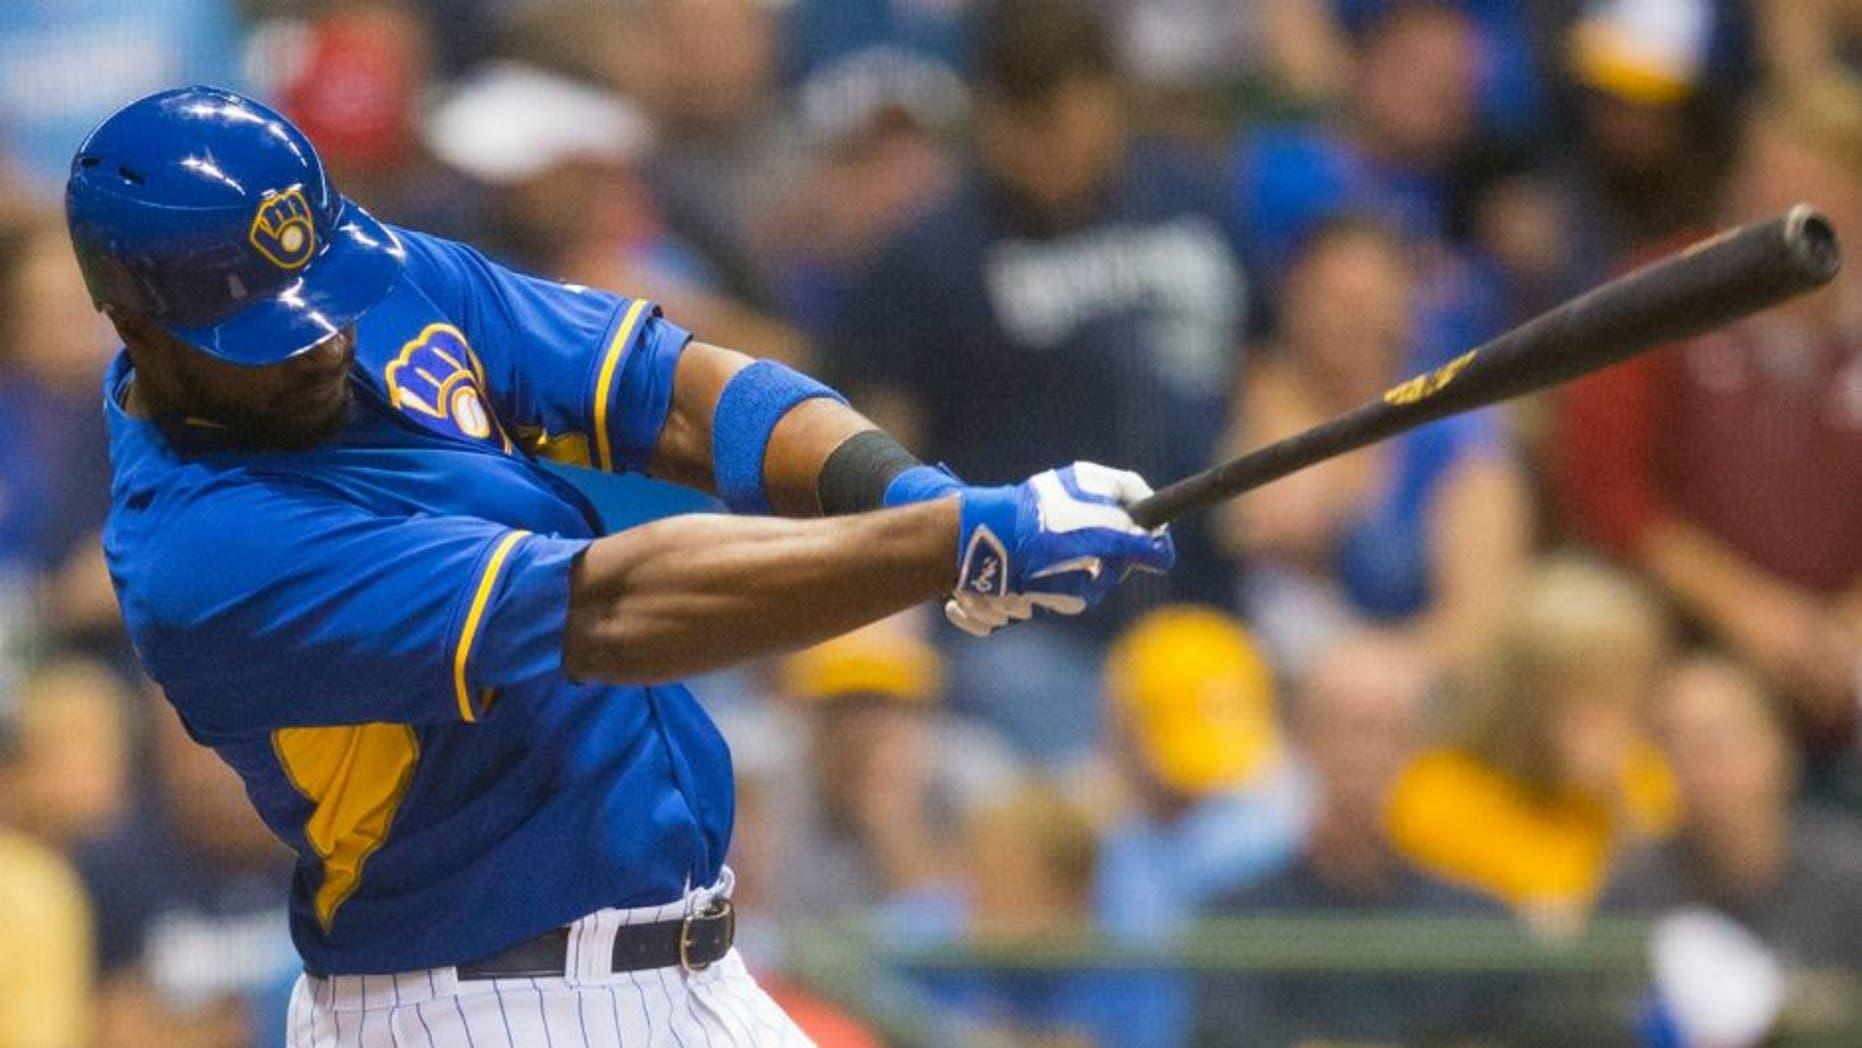 Sep 23, 2016; Milwaukee, WI, USA; Milwaukee Brewers first baseman Chris Carter (33) hits a home run during the second inning against the Cincinnati Reds at Miller Park. Mandatory Credit: Jeff Hanisch-USA TODAY Sports